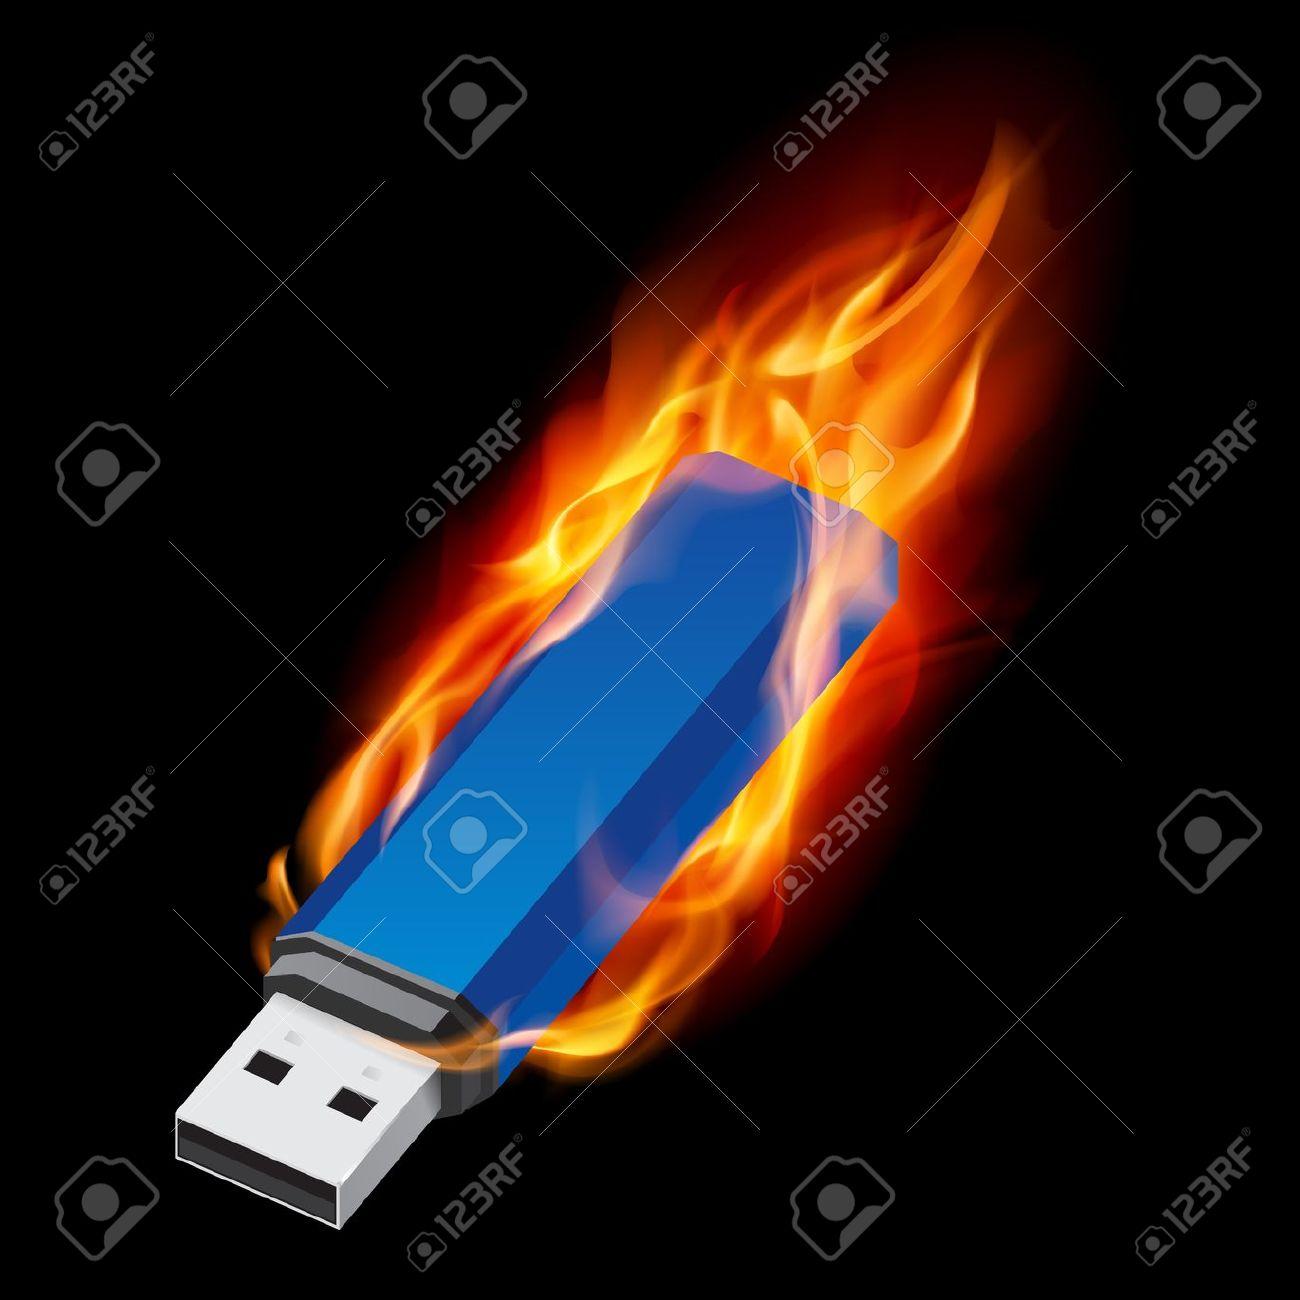 Blue USB Flash Drive In Fire. Illustration On Black Background.